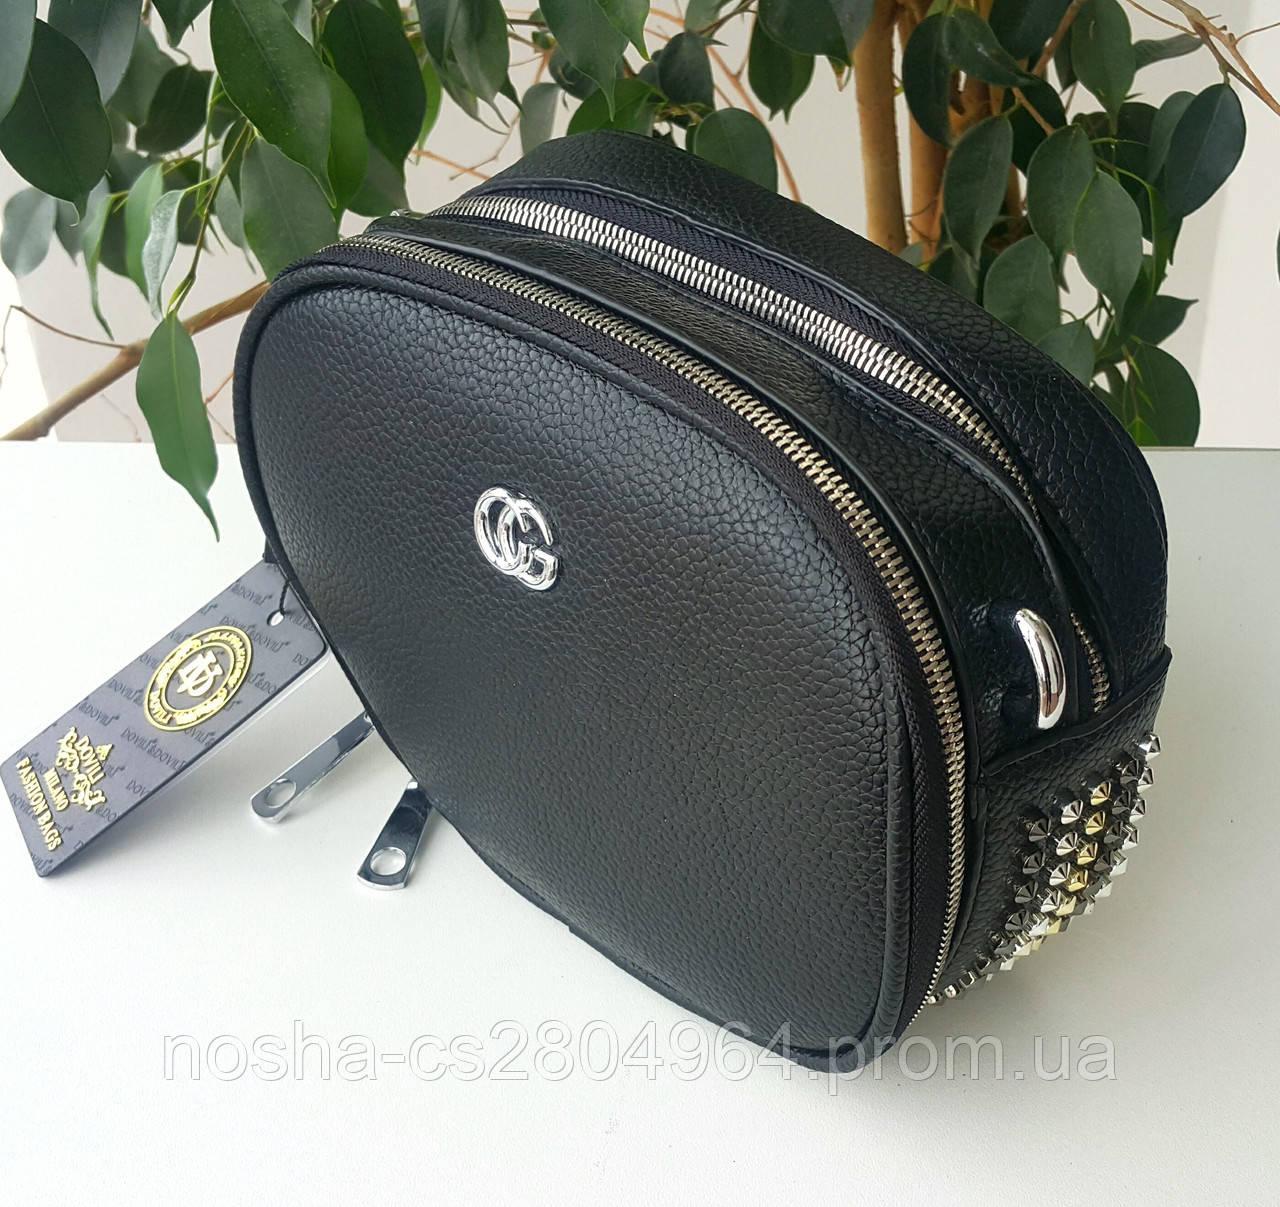 f65bb377bdf3 Сумка-клатч женская через плечо Гуччи/Gucci (копия): продажа, цена в ...